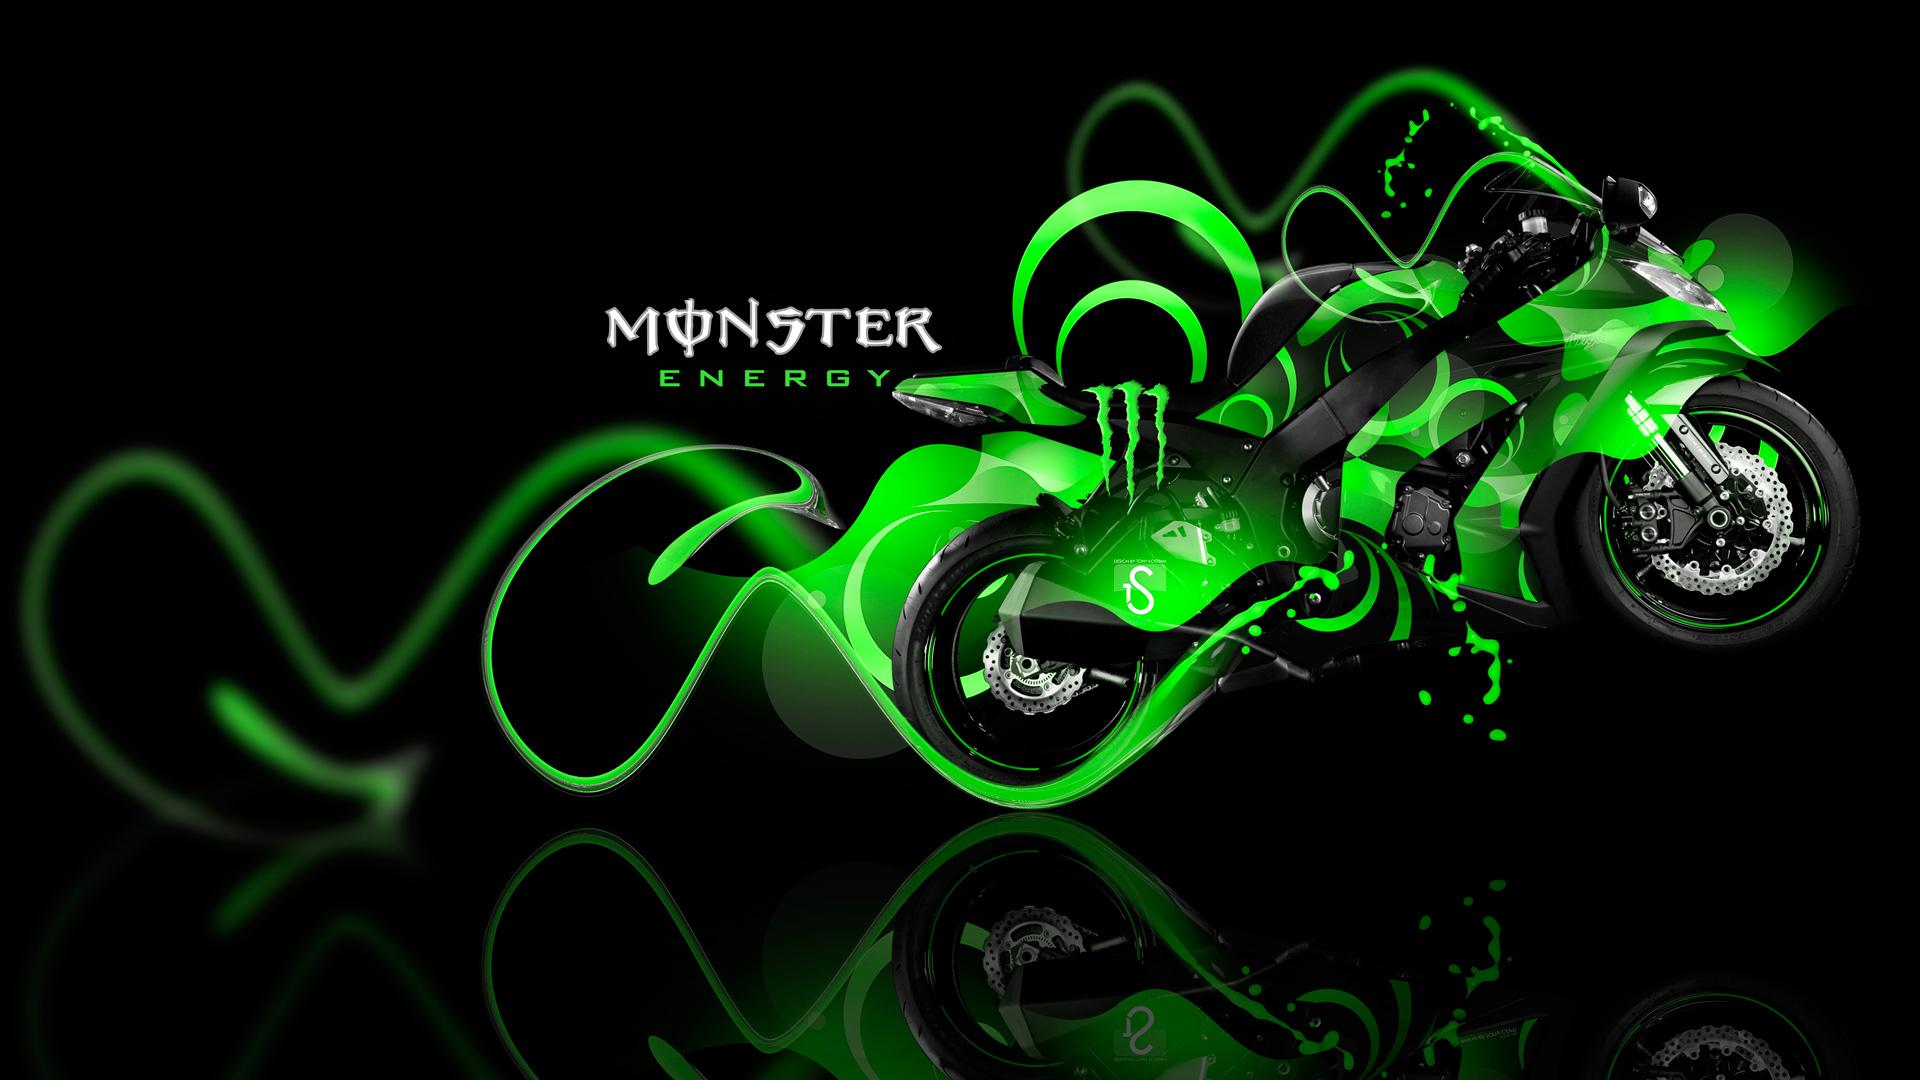 Neon Wallpaper Hd 3d Monster Energy Wallpaper Hd Pixelstalk Net